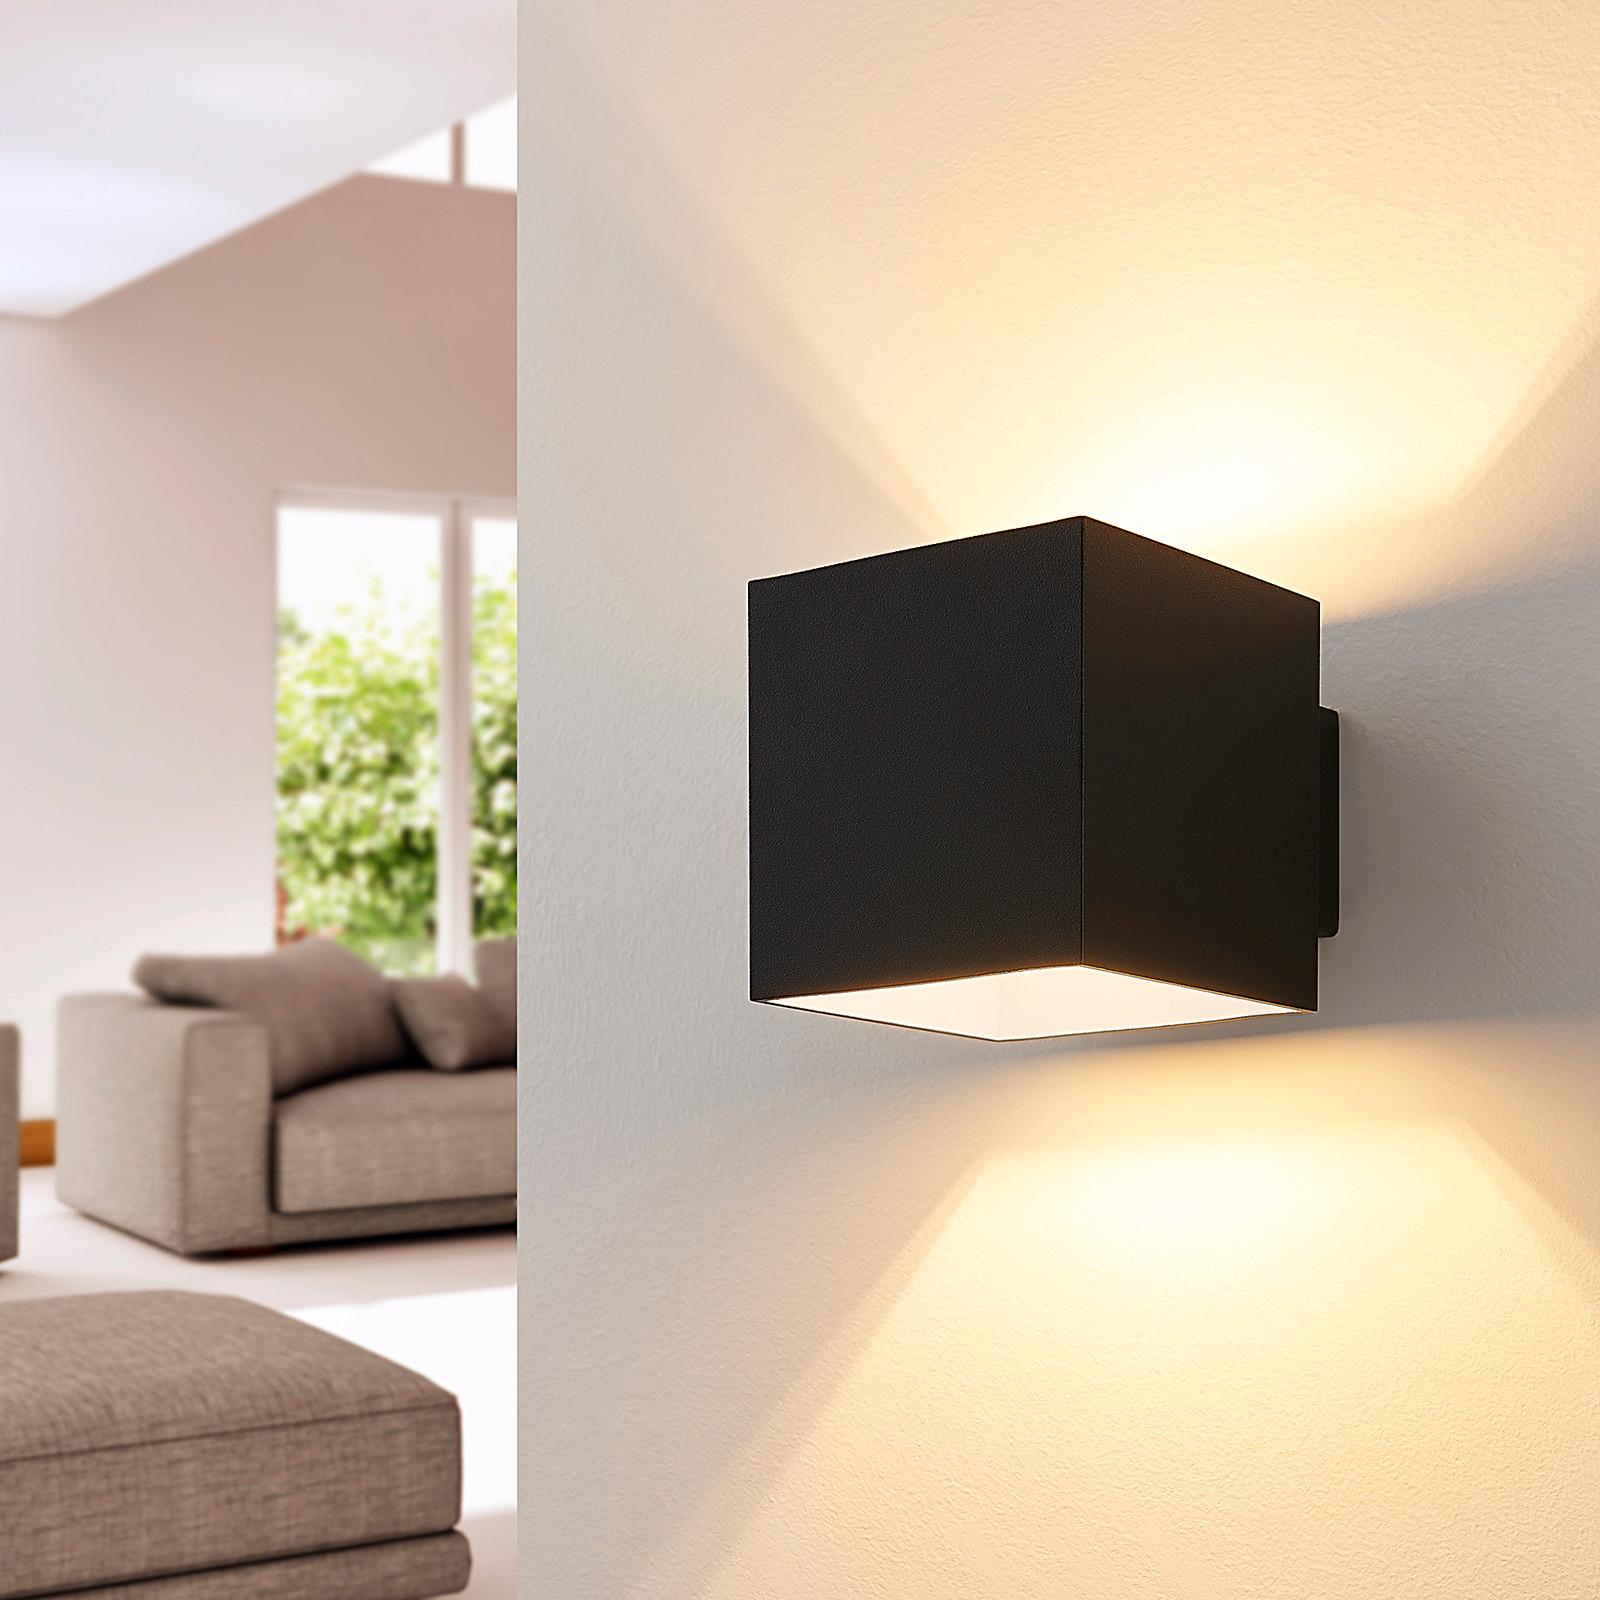 ELC Loriett lampa ścienna, G9, kątowa, czarna